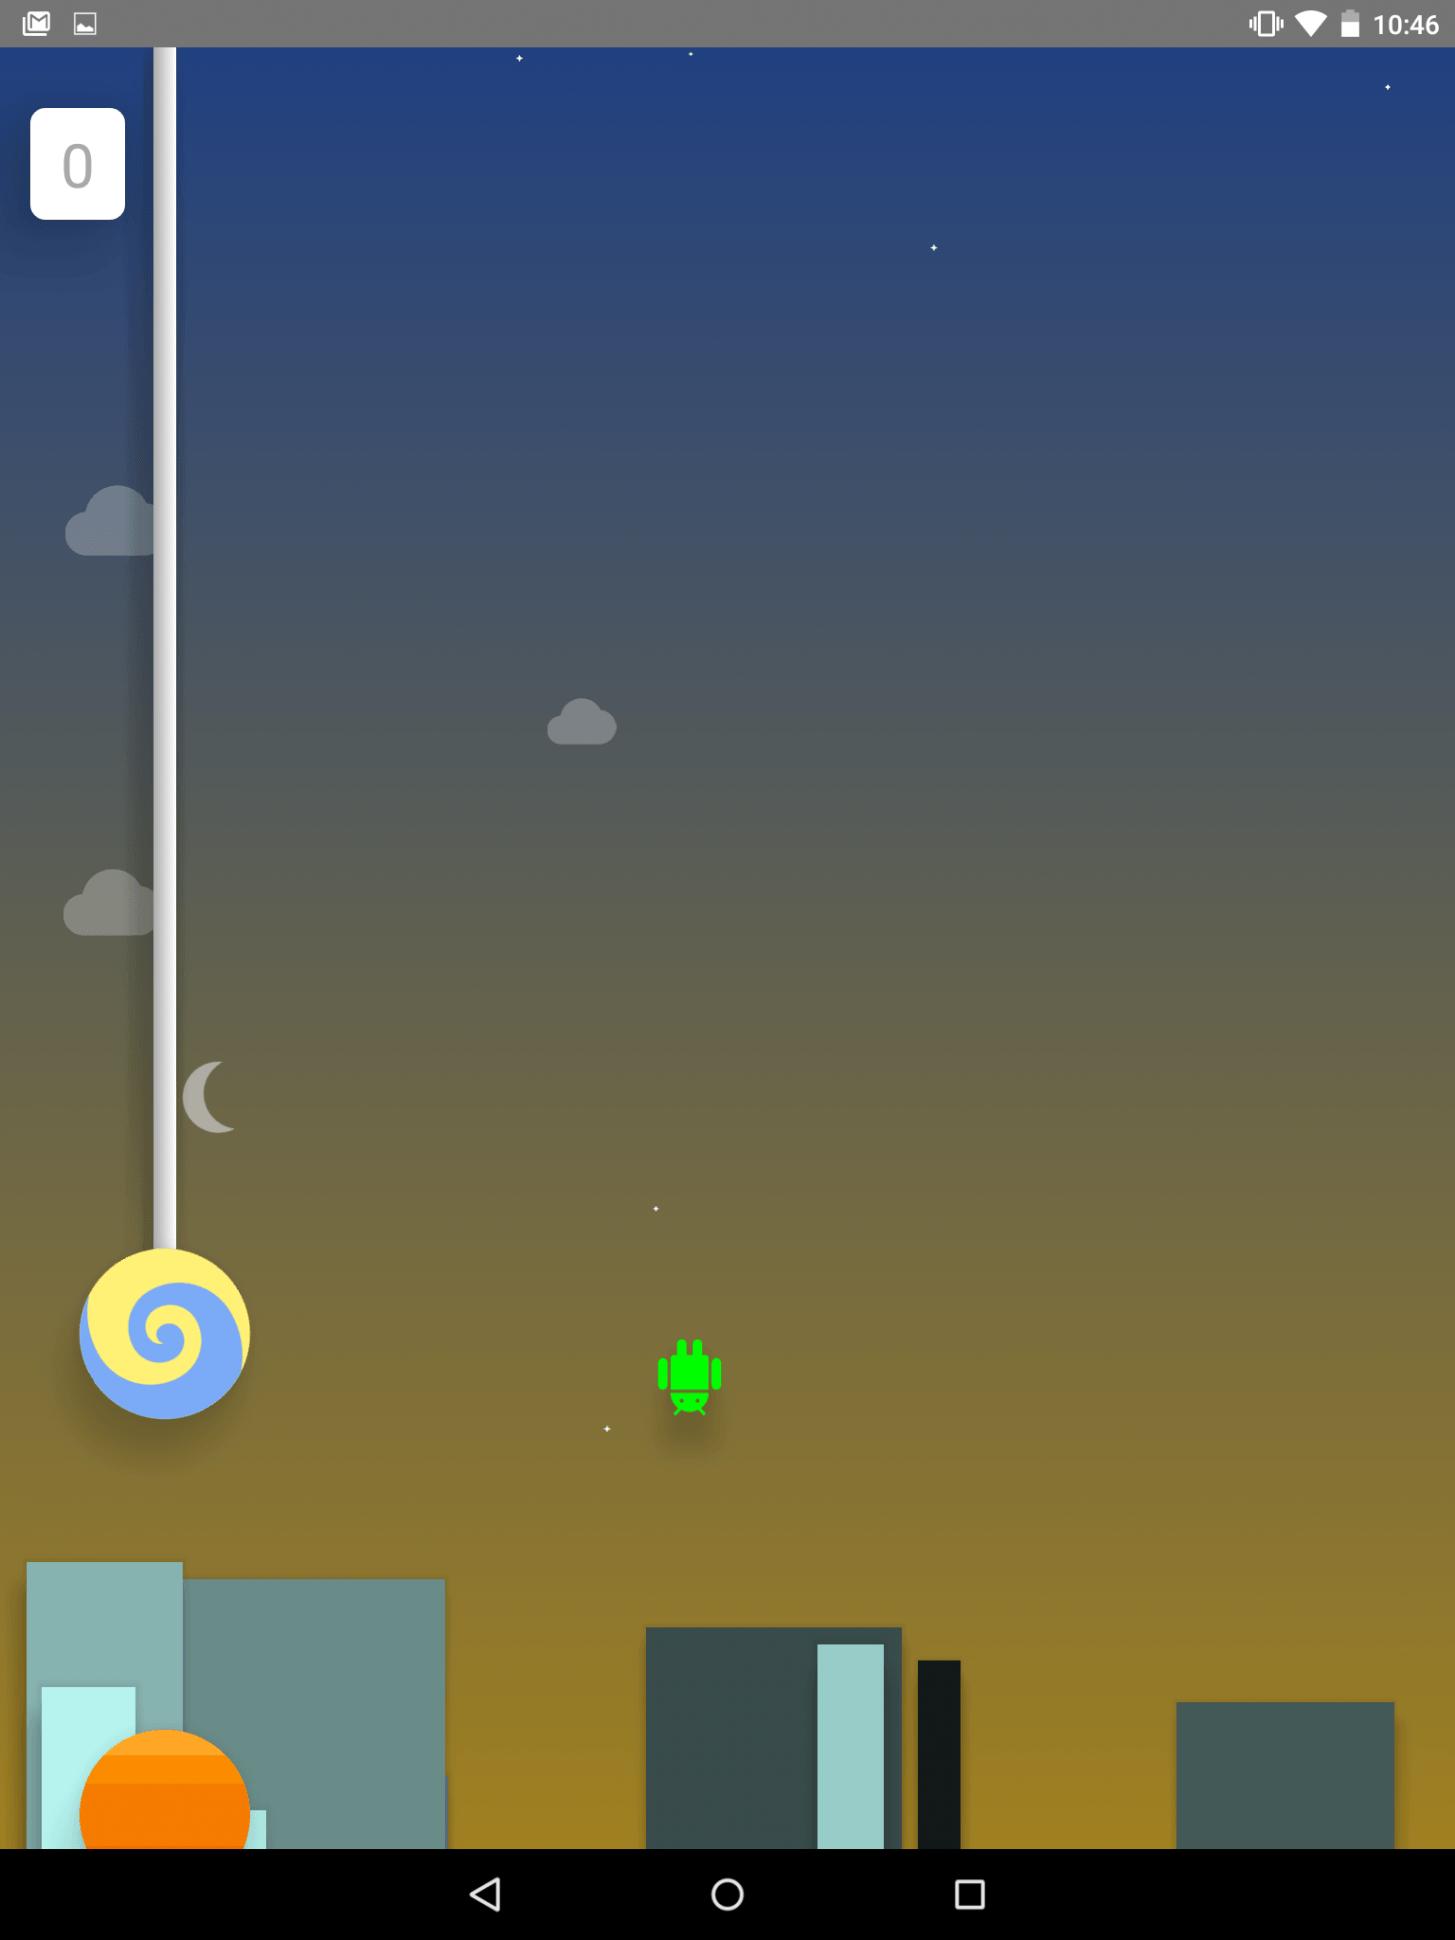 Play-Google-version-Flappy-Bird